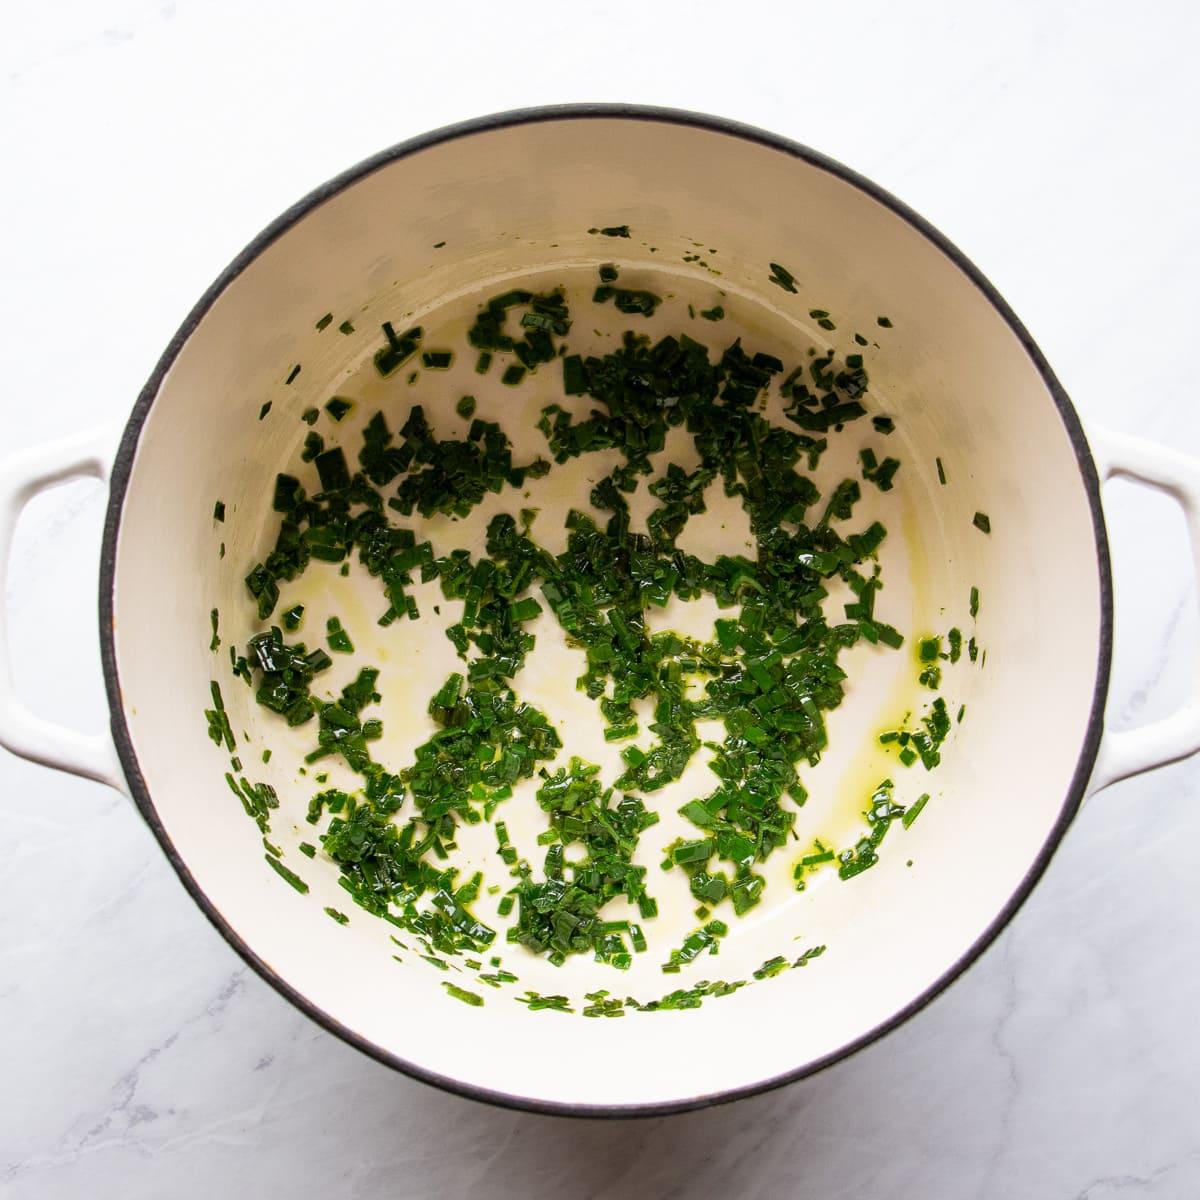 Step 1 - Saute the low FODMAP leek leaves in garlic-infused olive oil